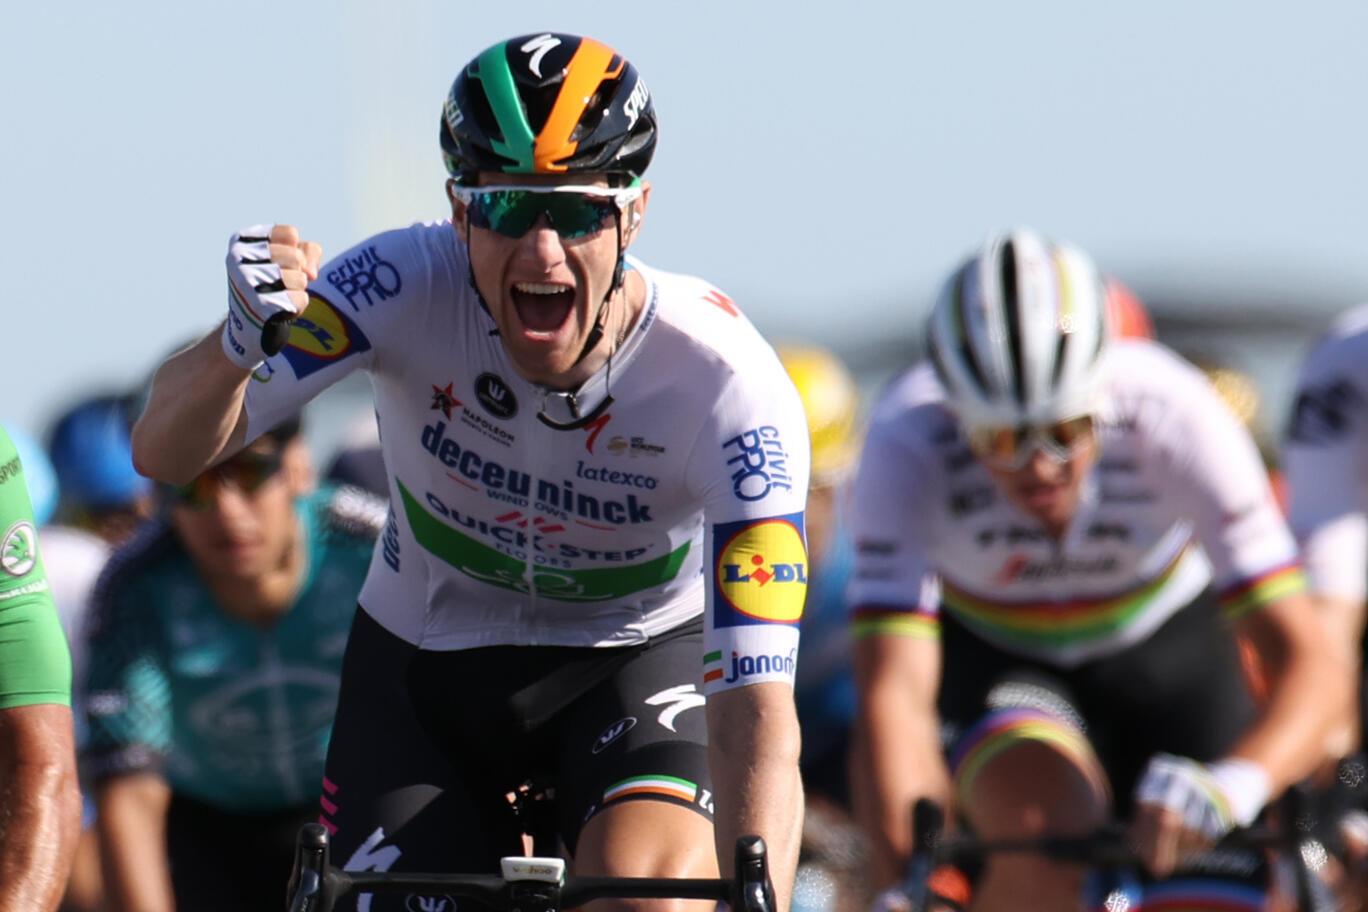 Sam Bennett won the 10th stage of the 2020 Tour de France after a 170km ride between the Ile d'Oléron and the Ile de Ré.